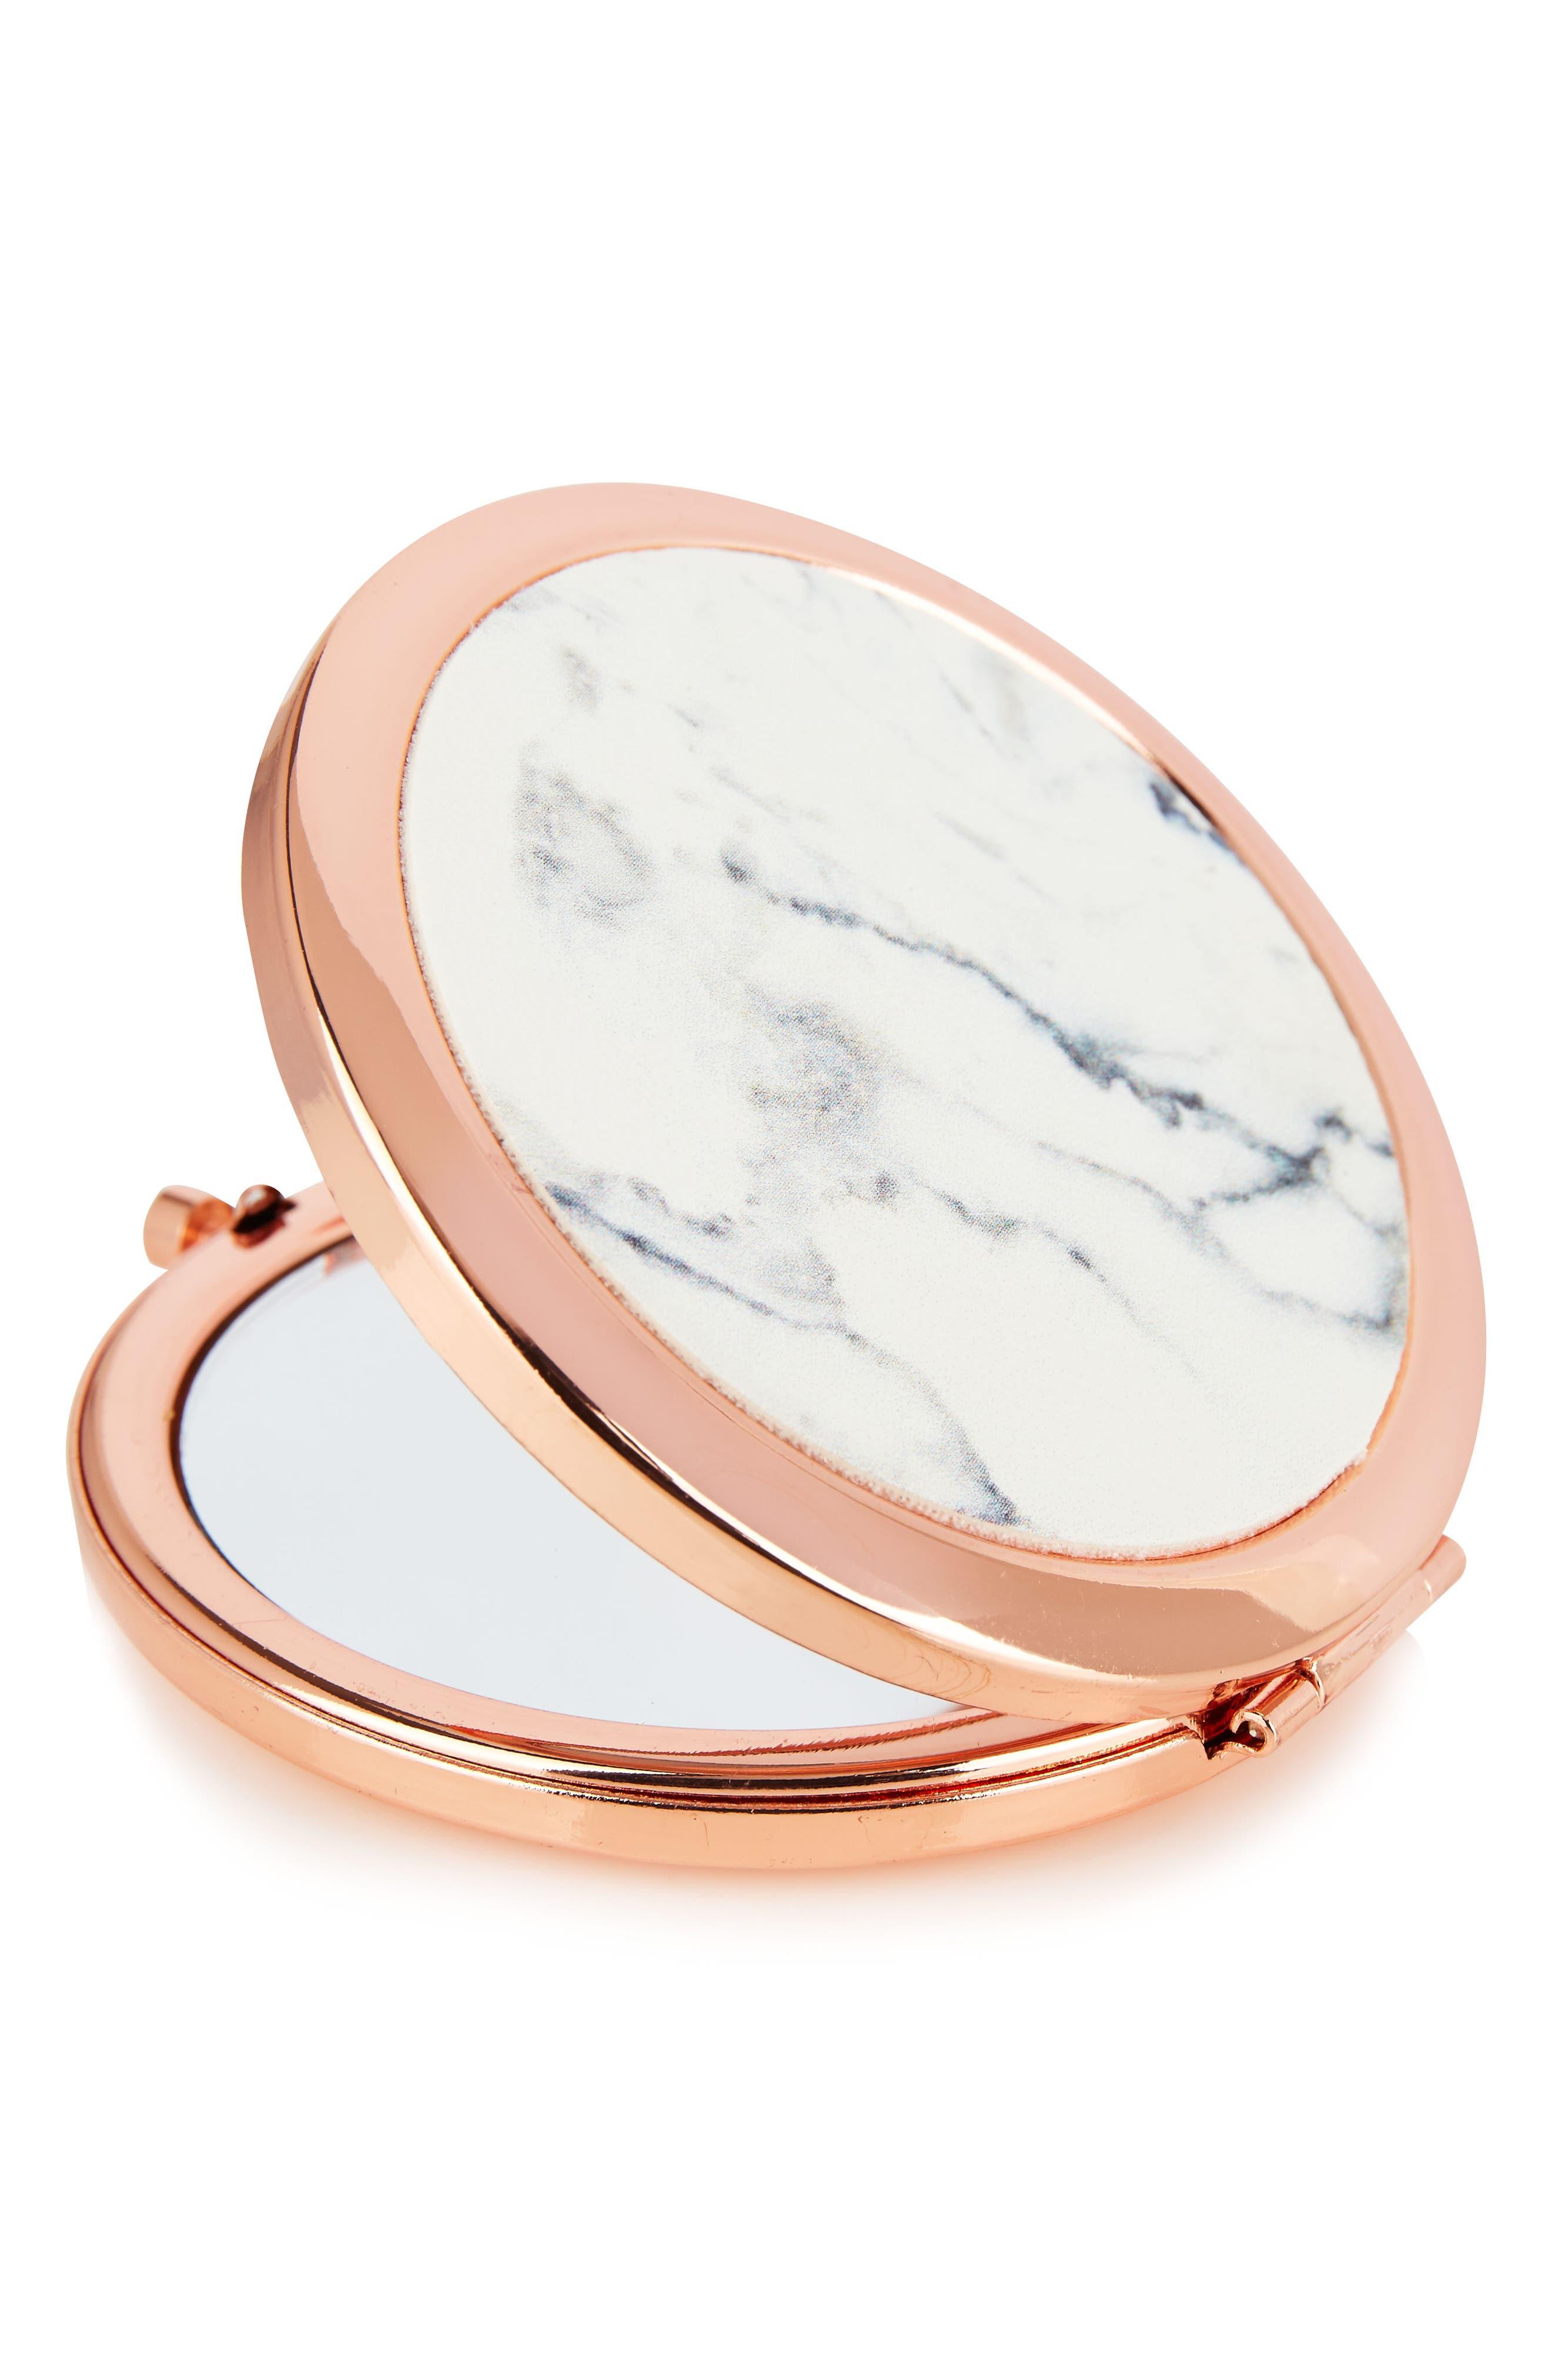 SKINNYDIP,                             Skinny Dip Marble Compact Mirror,                             Main thumbnail 1, color,                             000